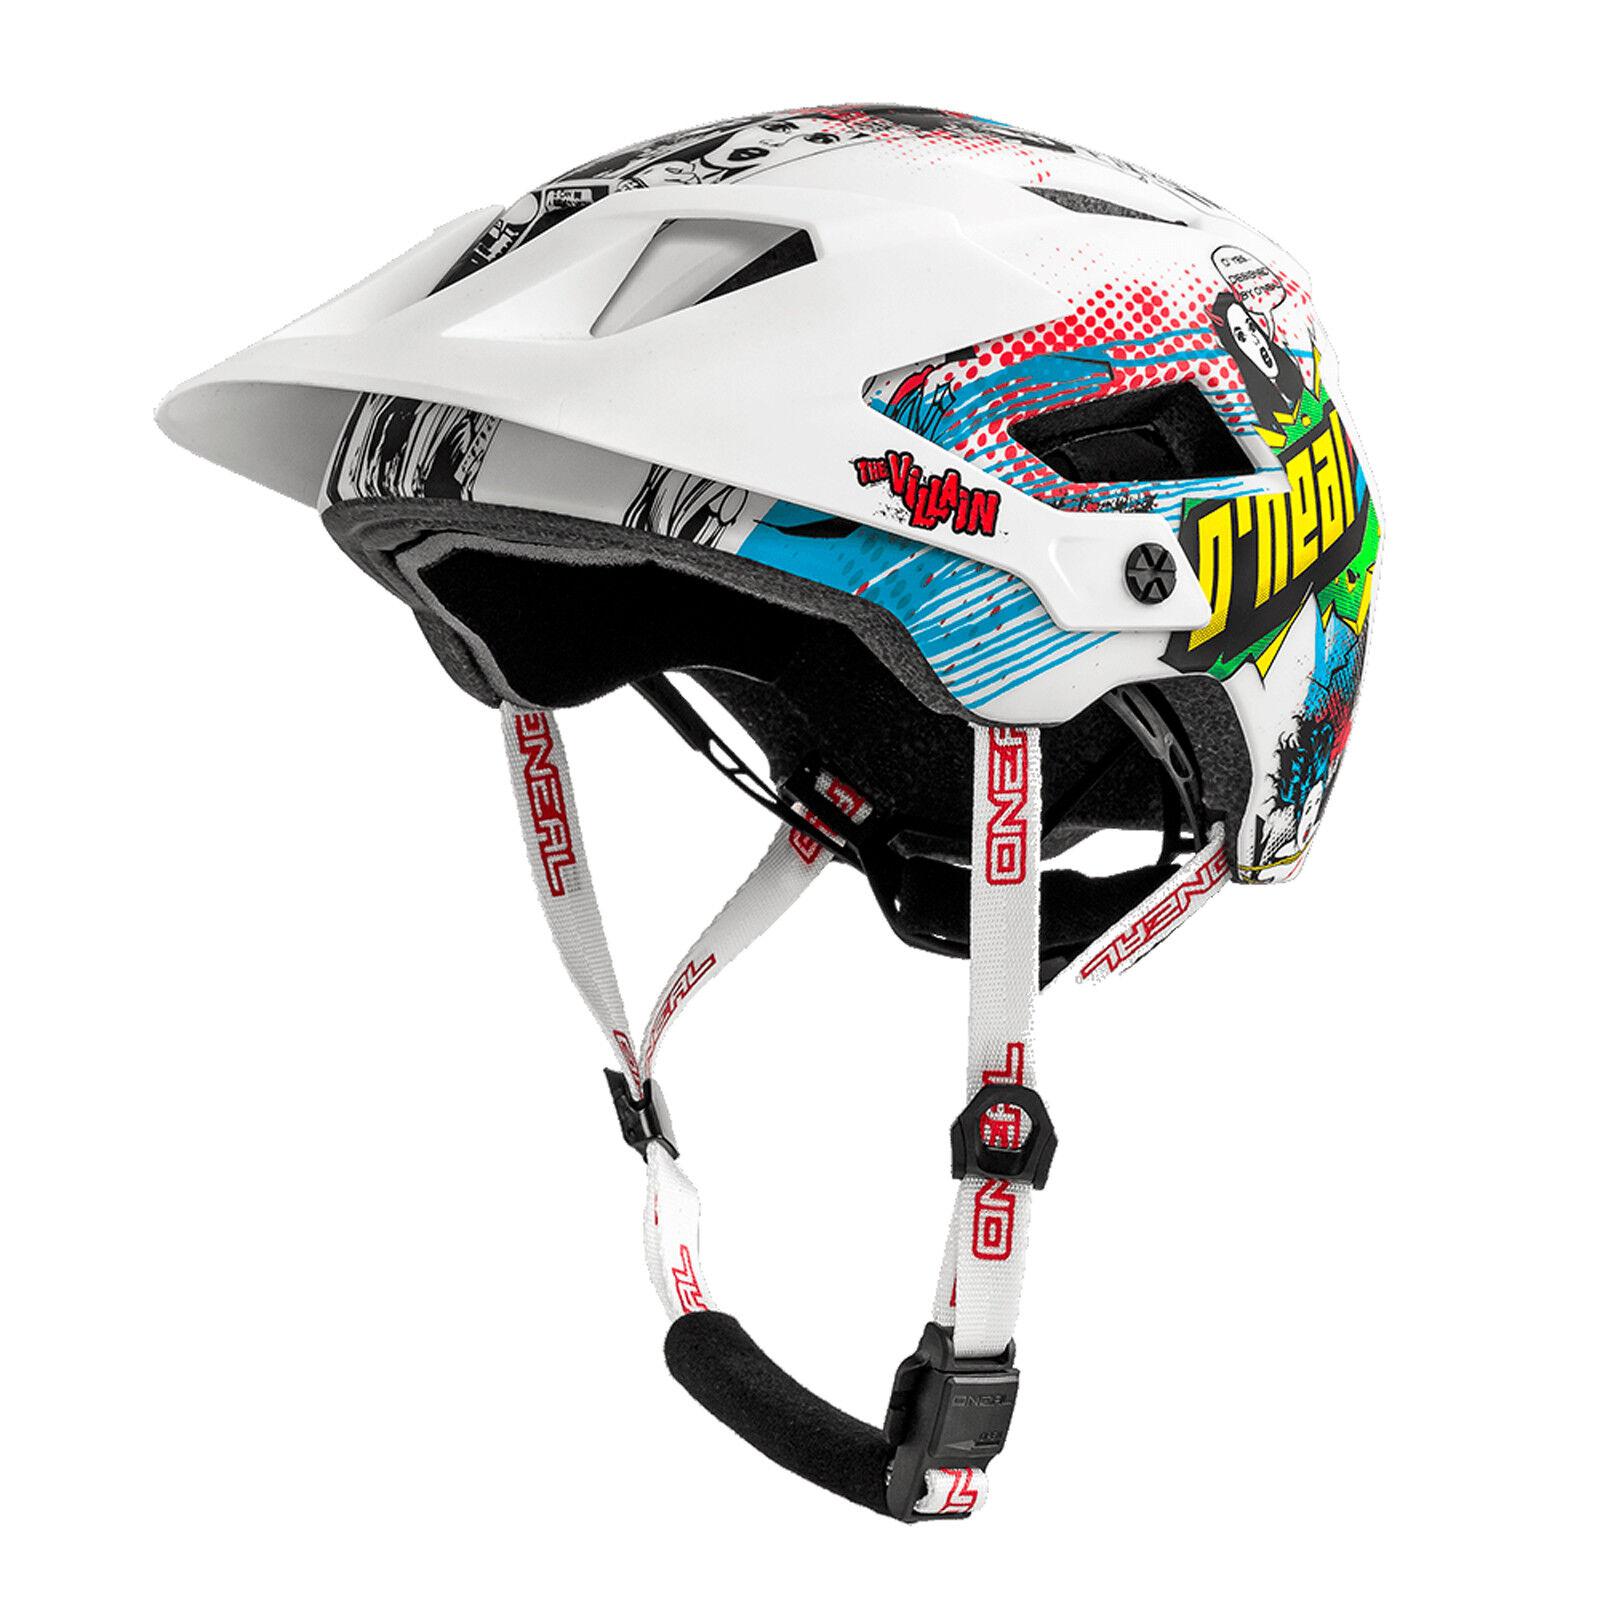 O 'neal defender 2.0 Villain All mountain MTB bicicleta casco blancoo multi 2019 oneal